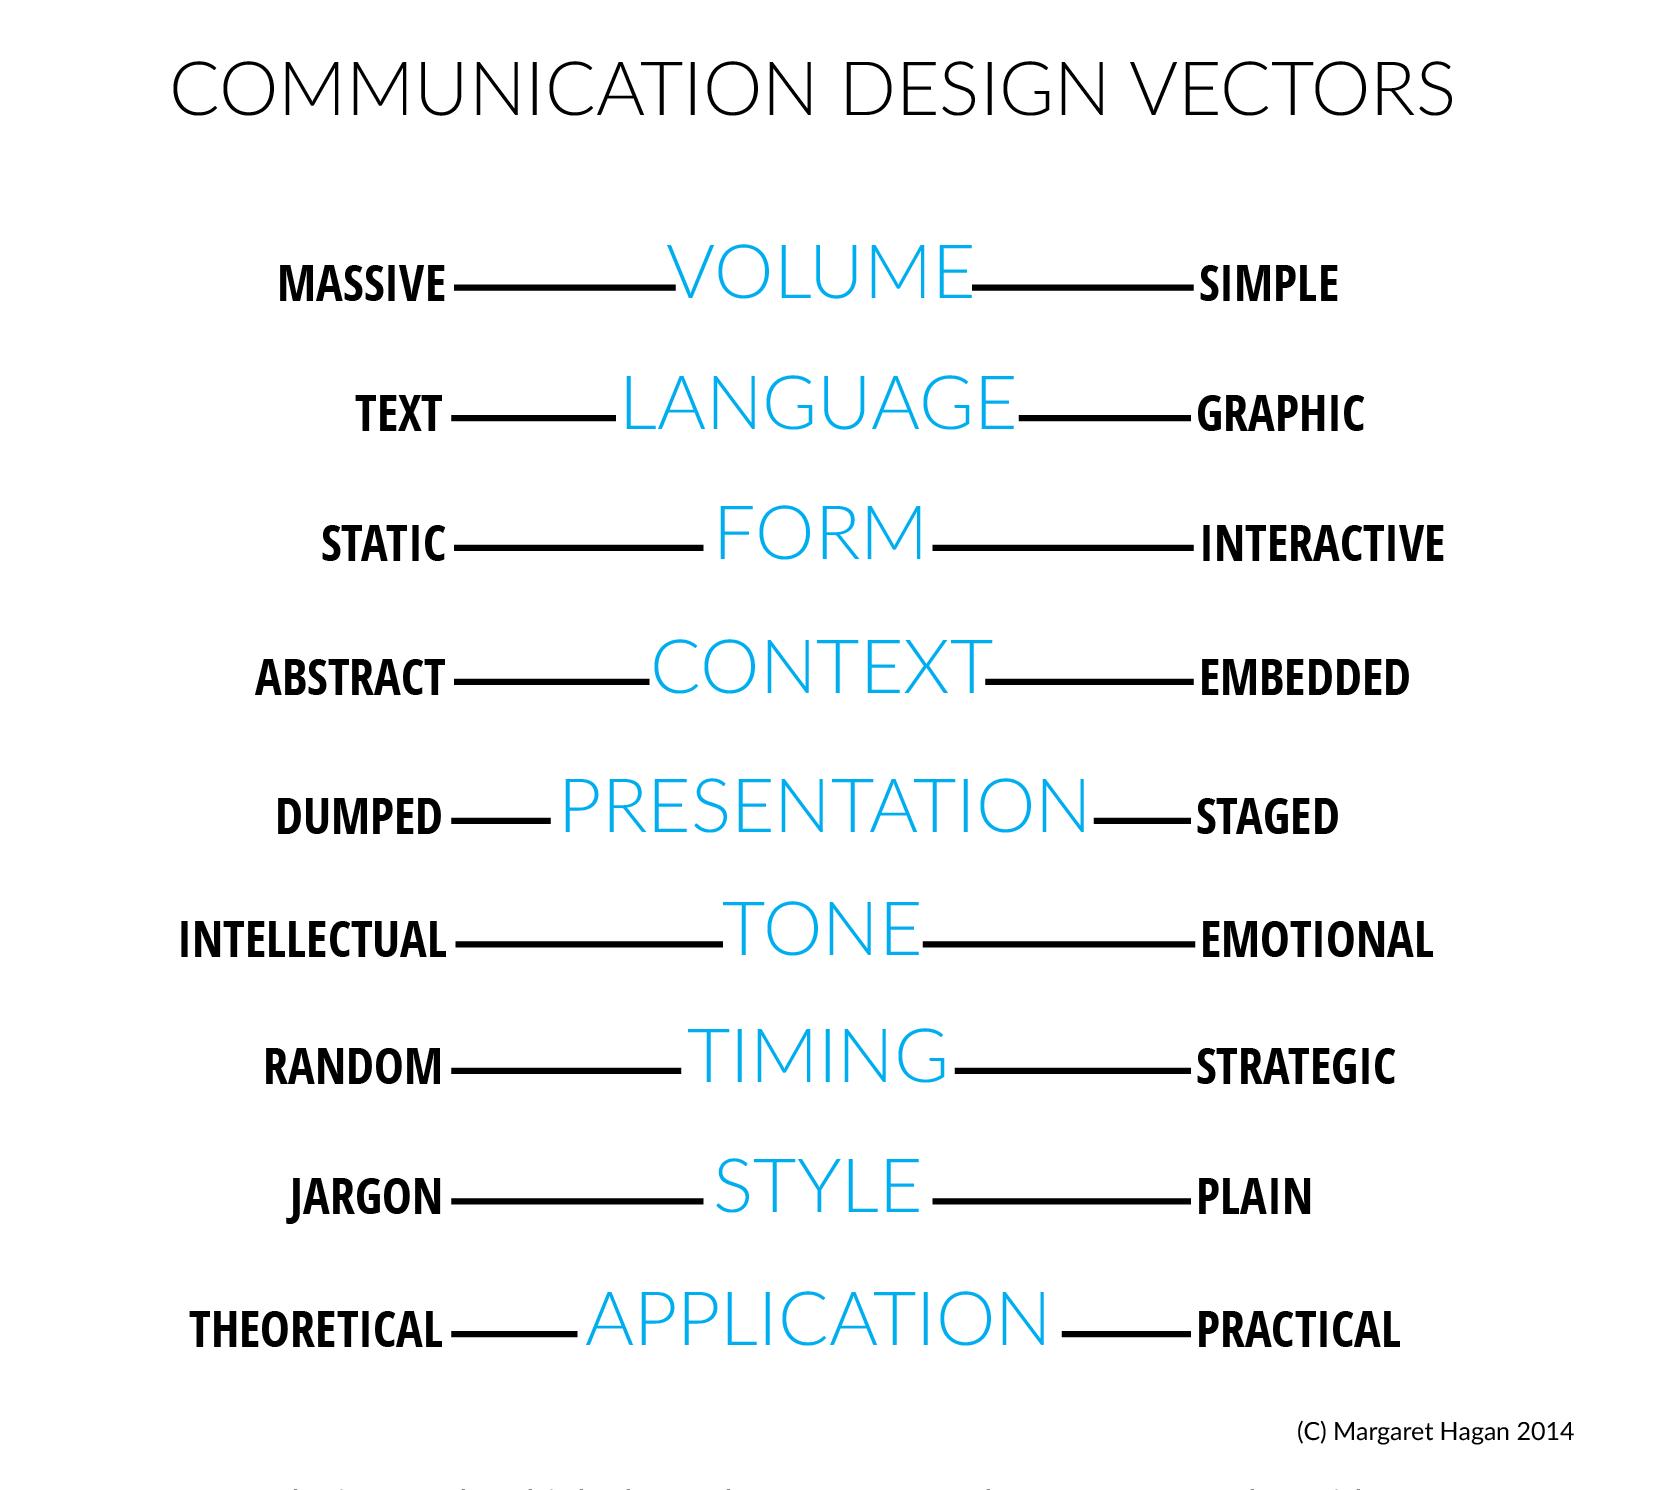 Design Vectors Spectrums no explanation-03